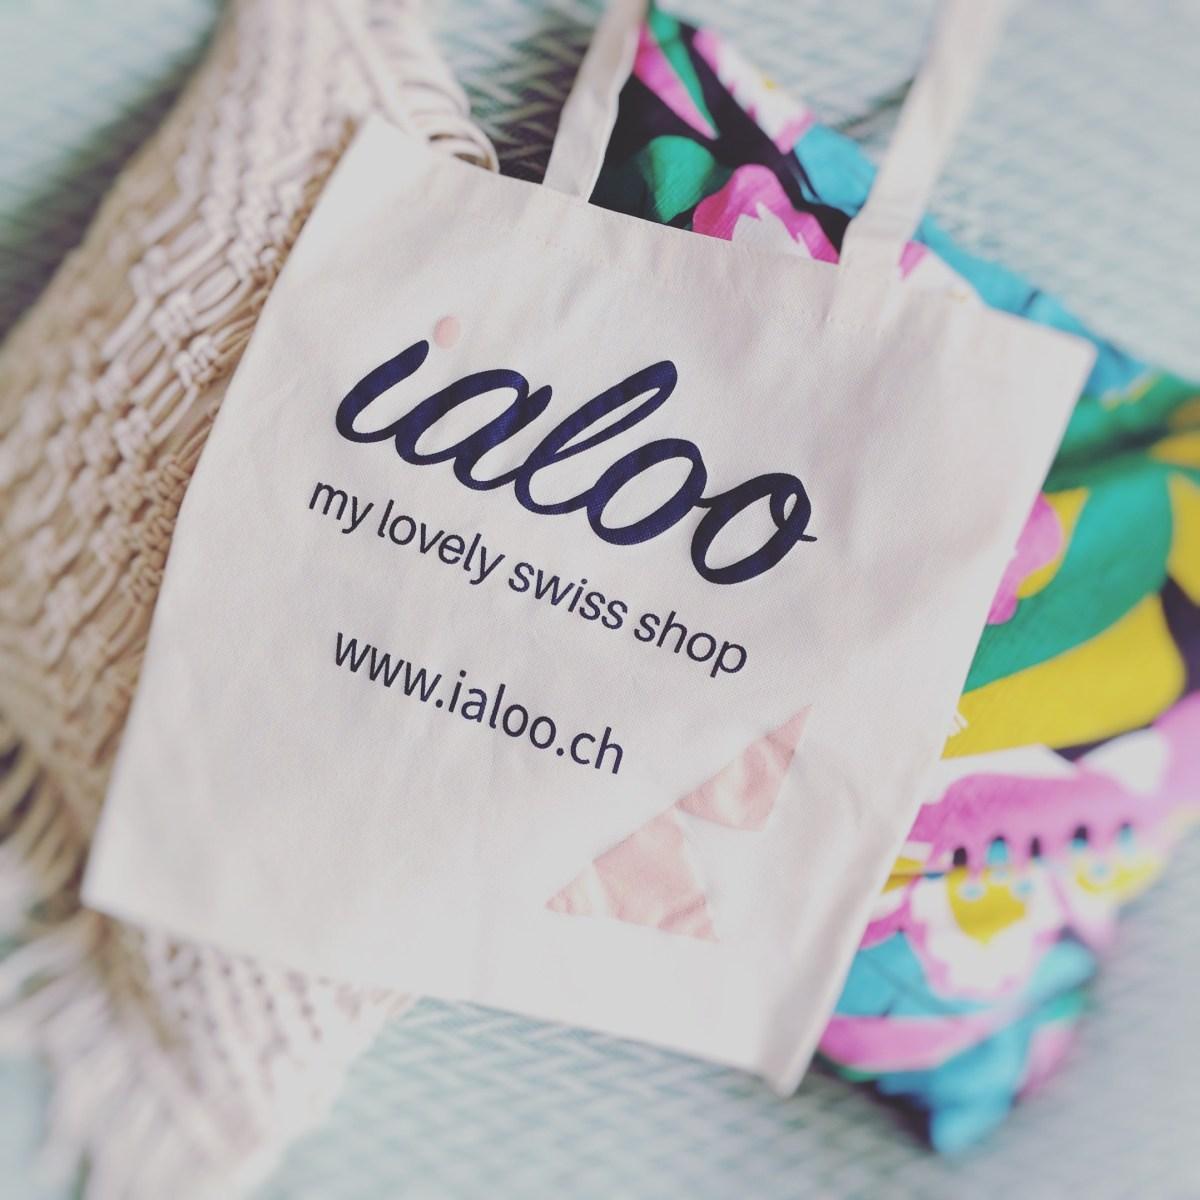 Ialoo artisanat fait main handmade switzerland suisse interview blog thereseandthekids